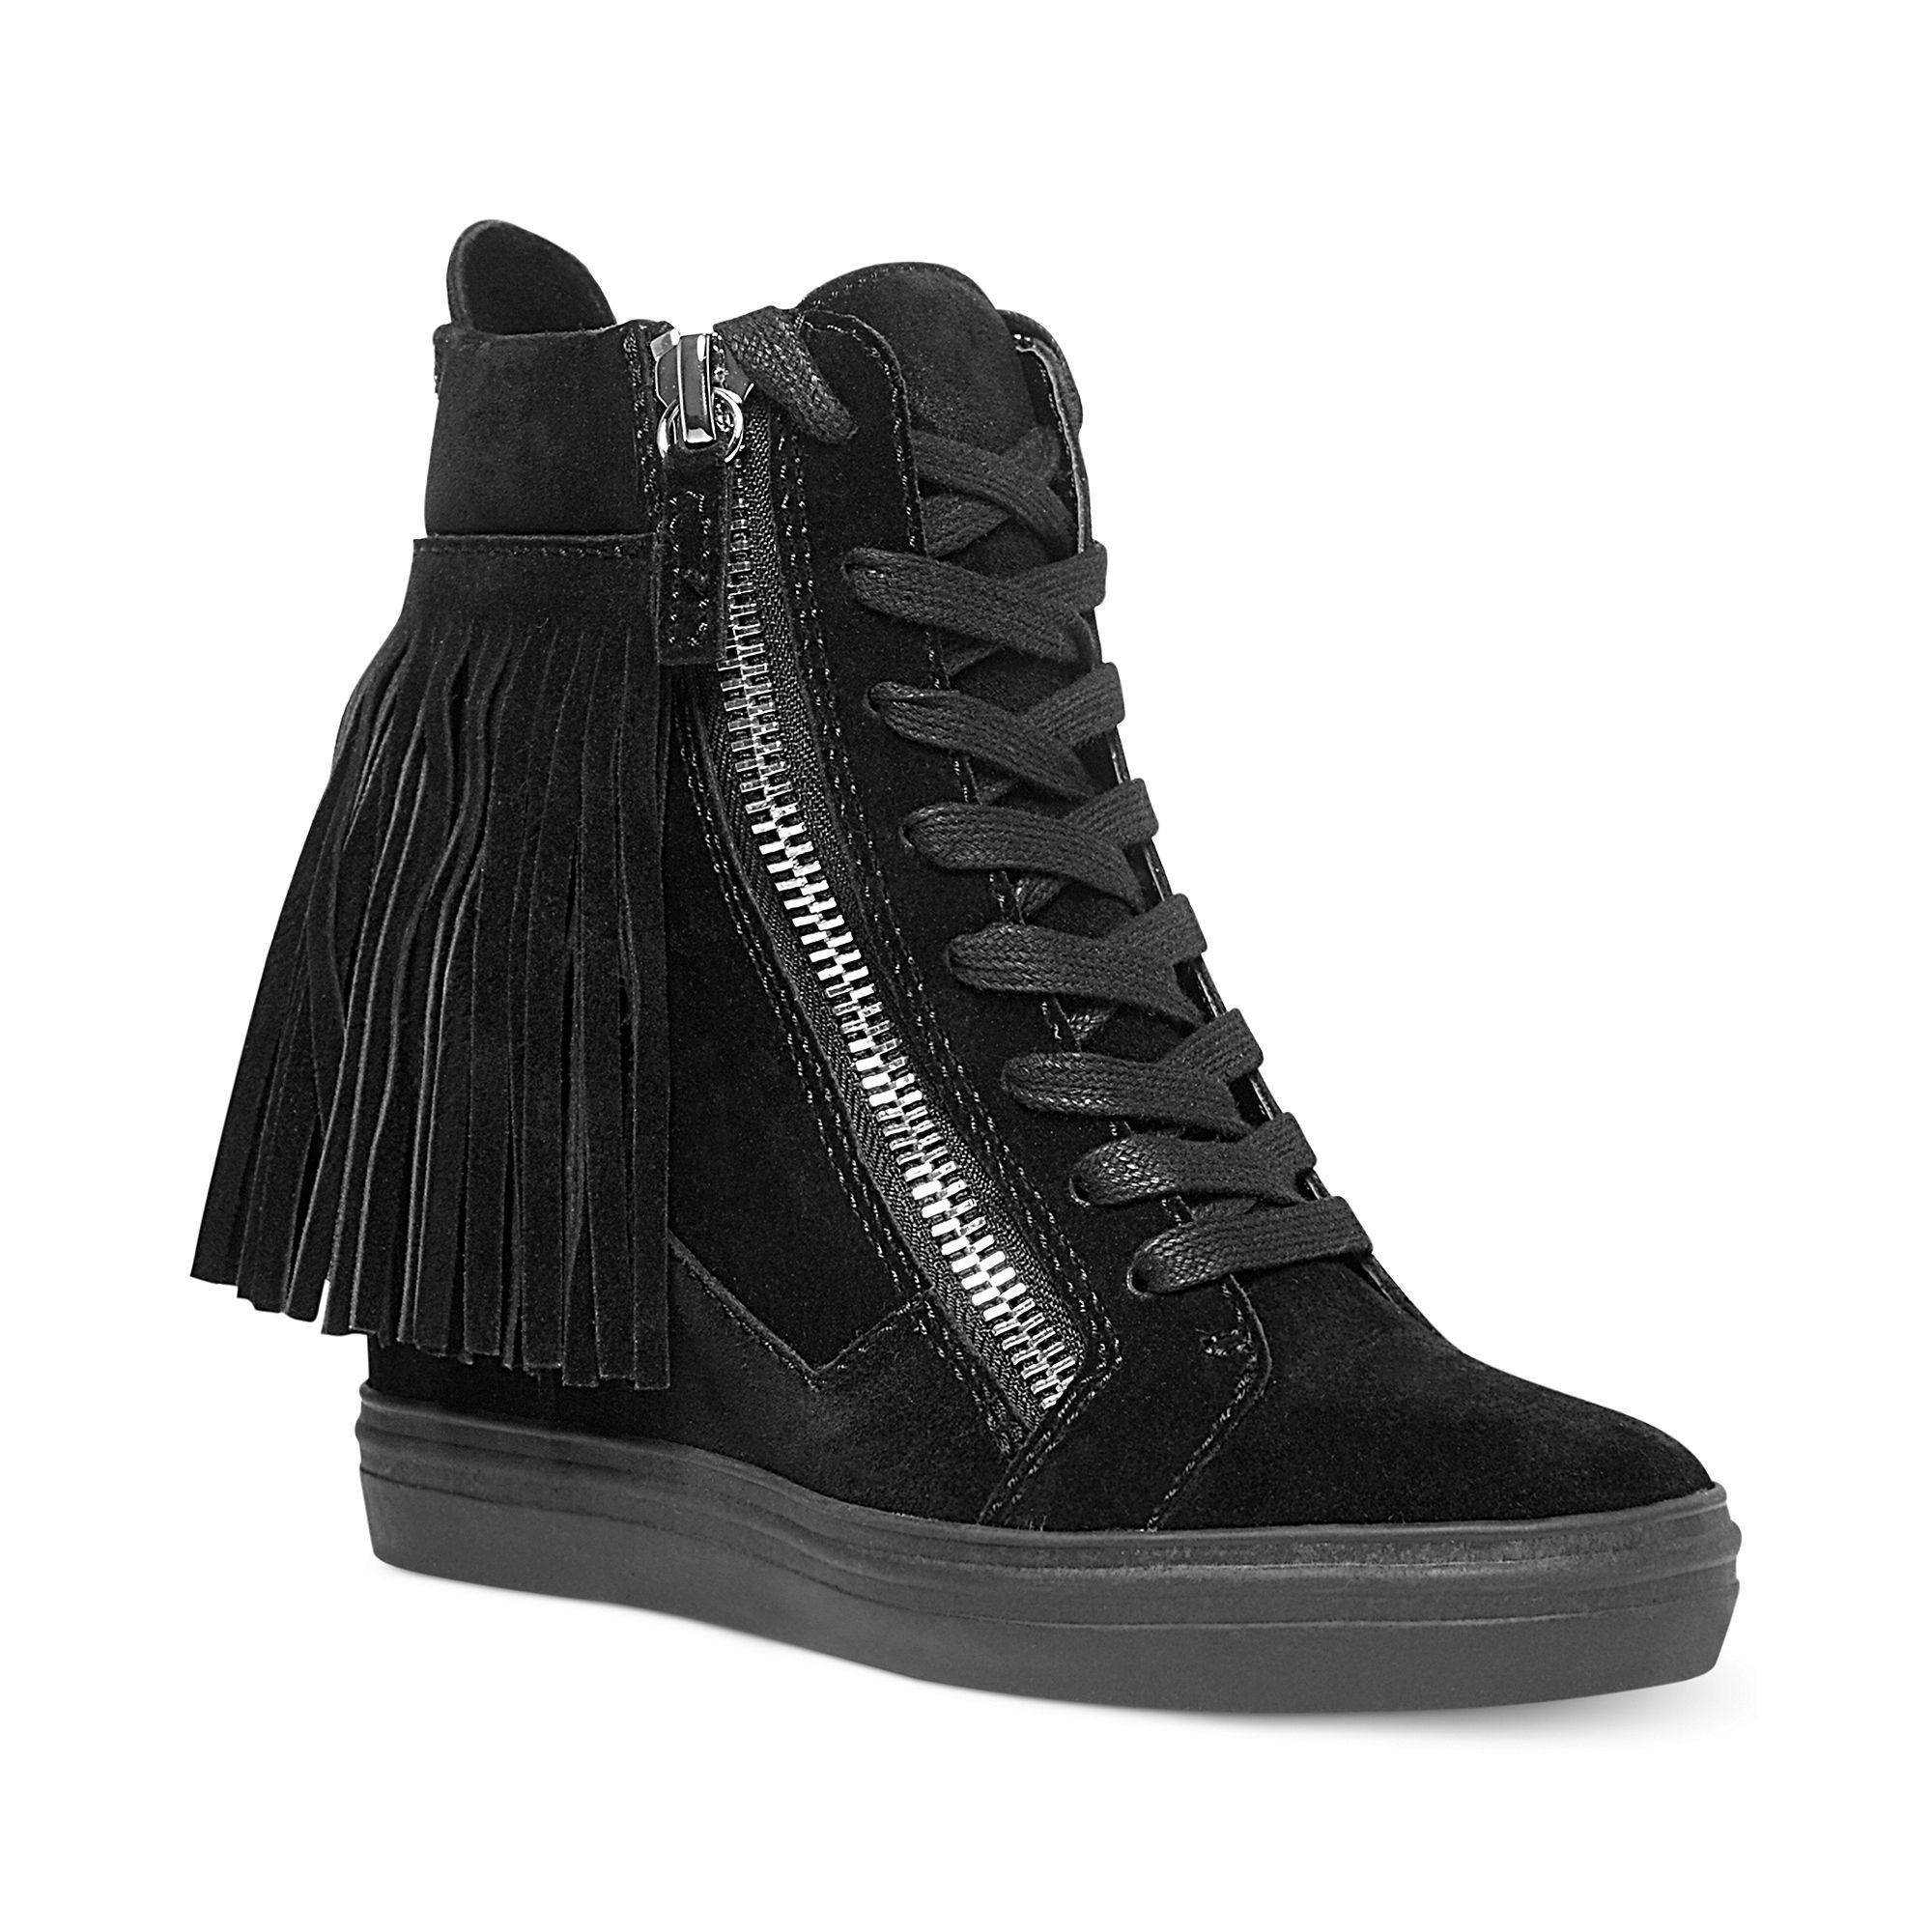 Steve Madden Georgia Fringe Wedge Sneakers In Black Lyst